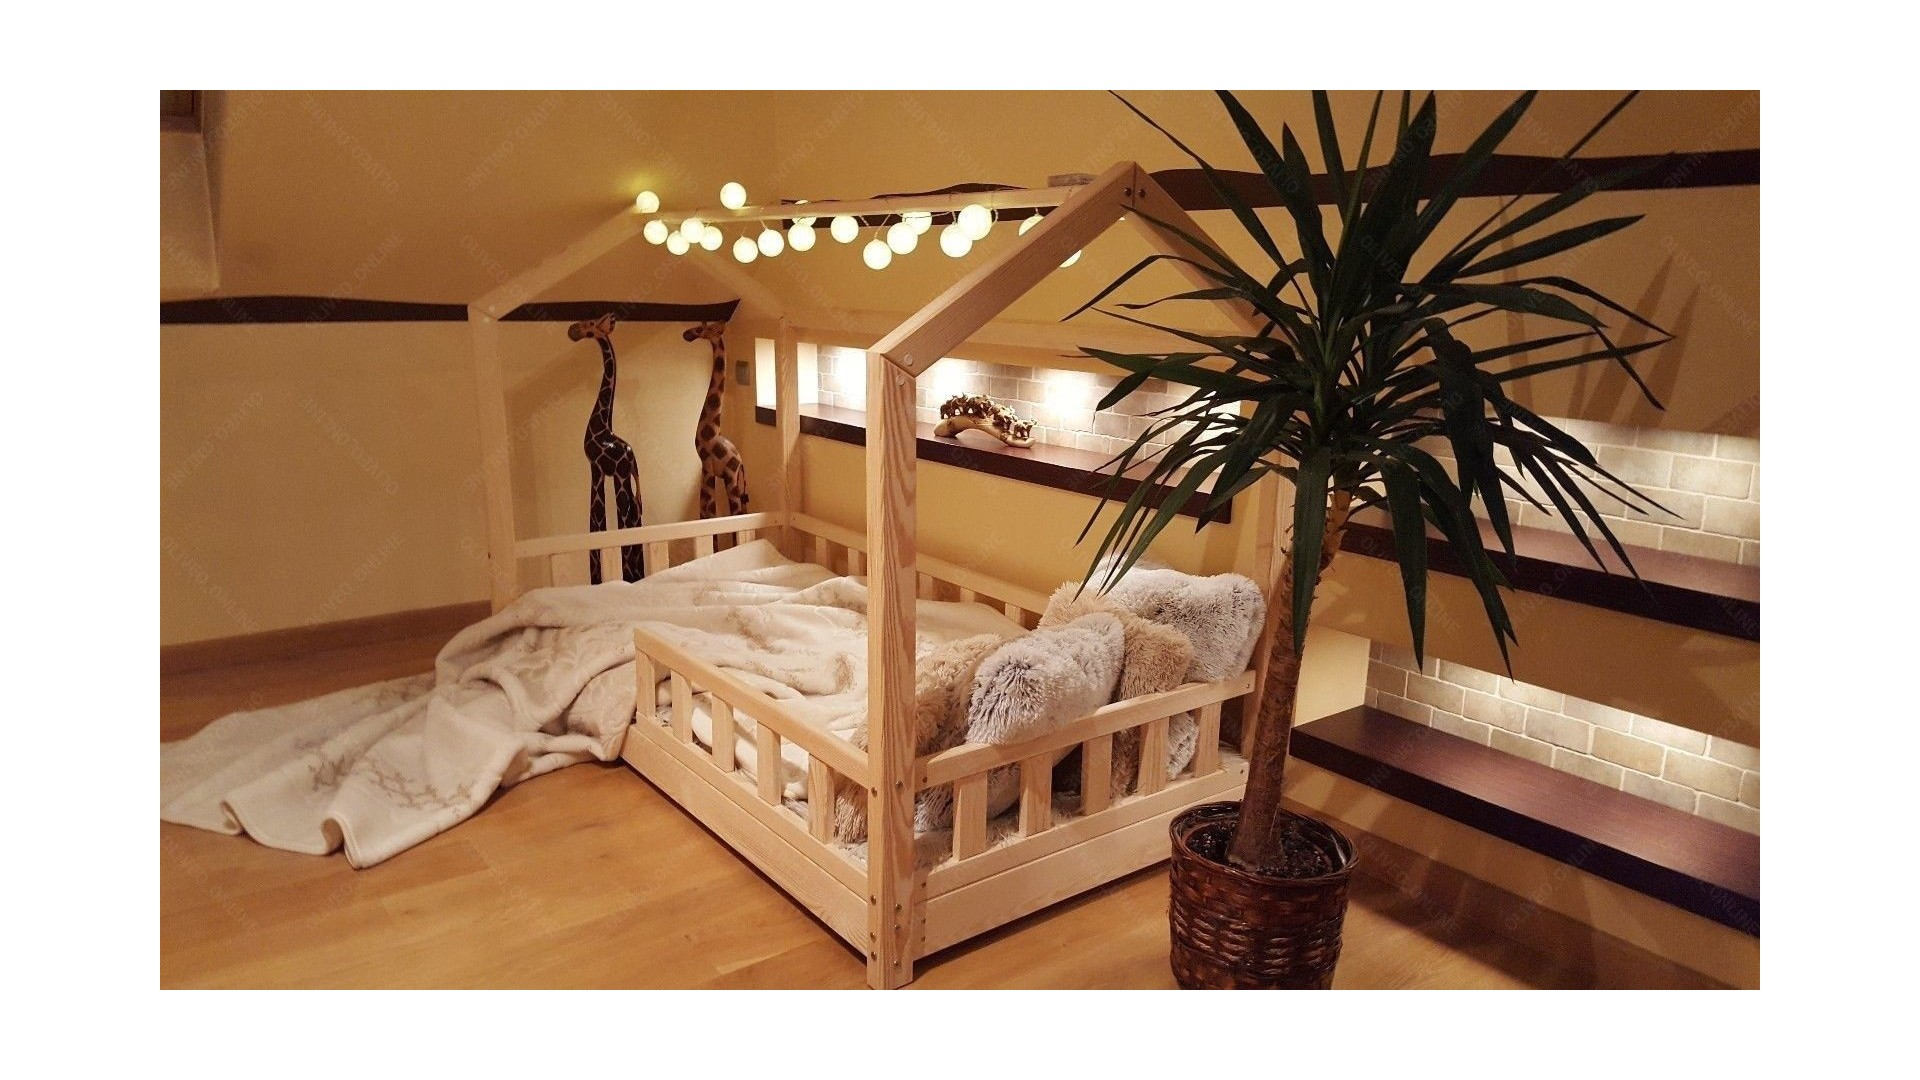 house bed bella with barrier 90 x 190cm house bed. Black Bedroom Furniture Sets. Home Design Ideas